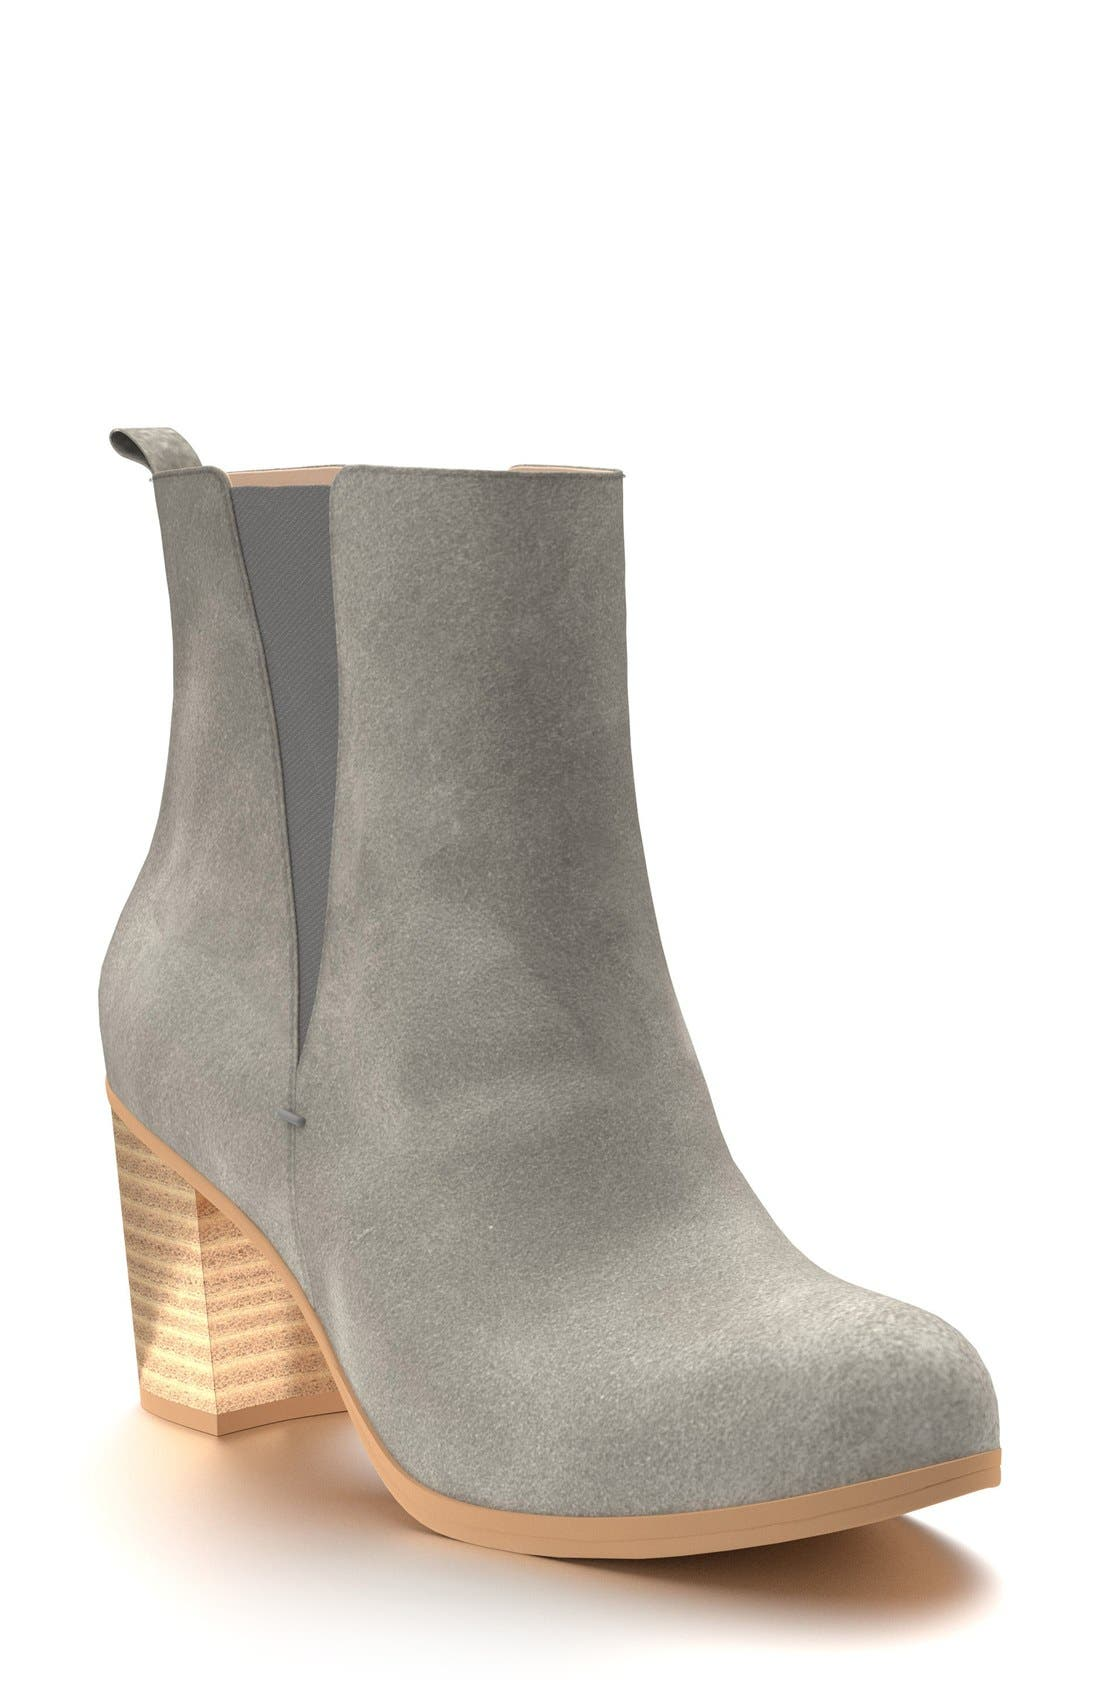 Alternate Image 1 Selected - Shoes of Prey Block Heel Chelsea Boot (Women)